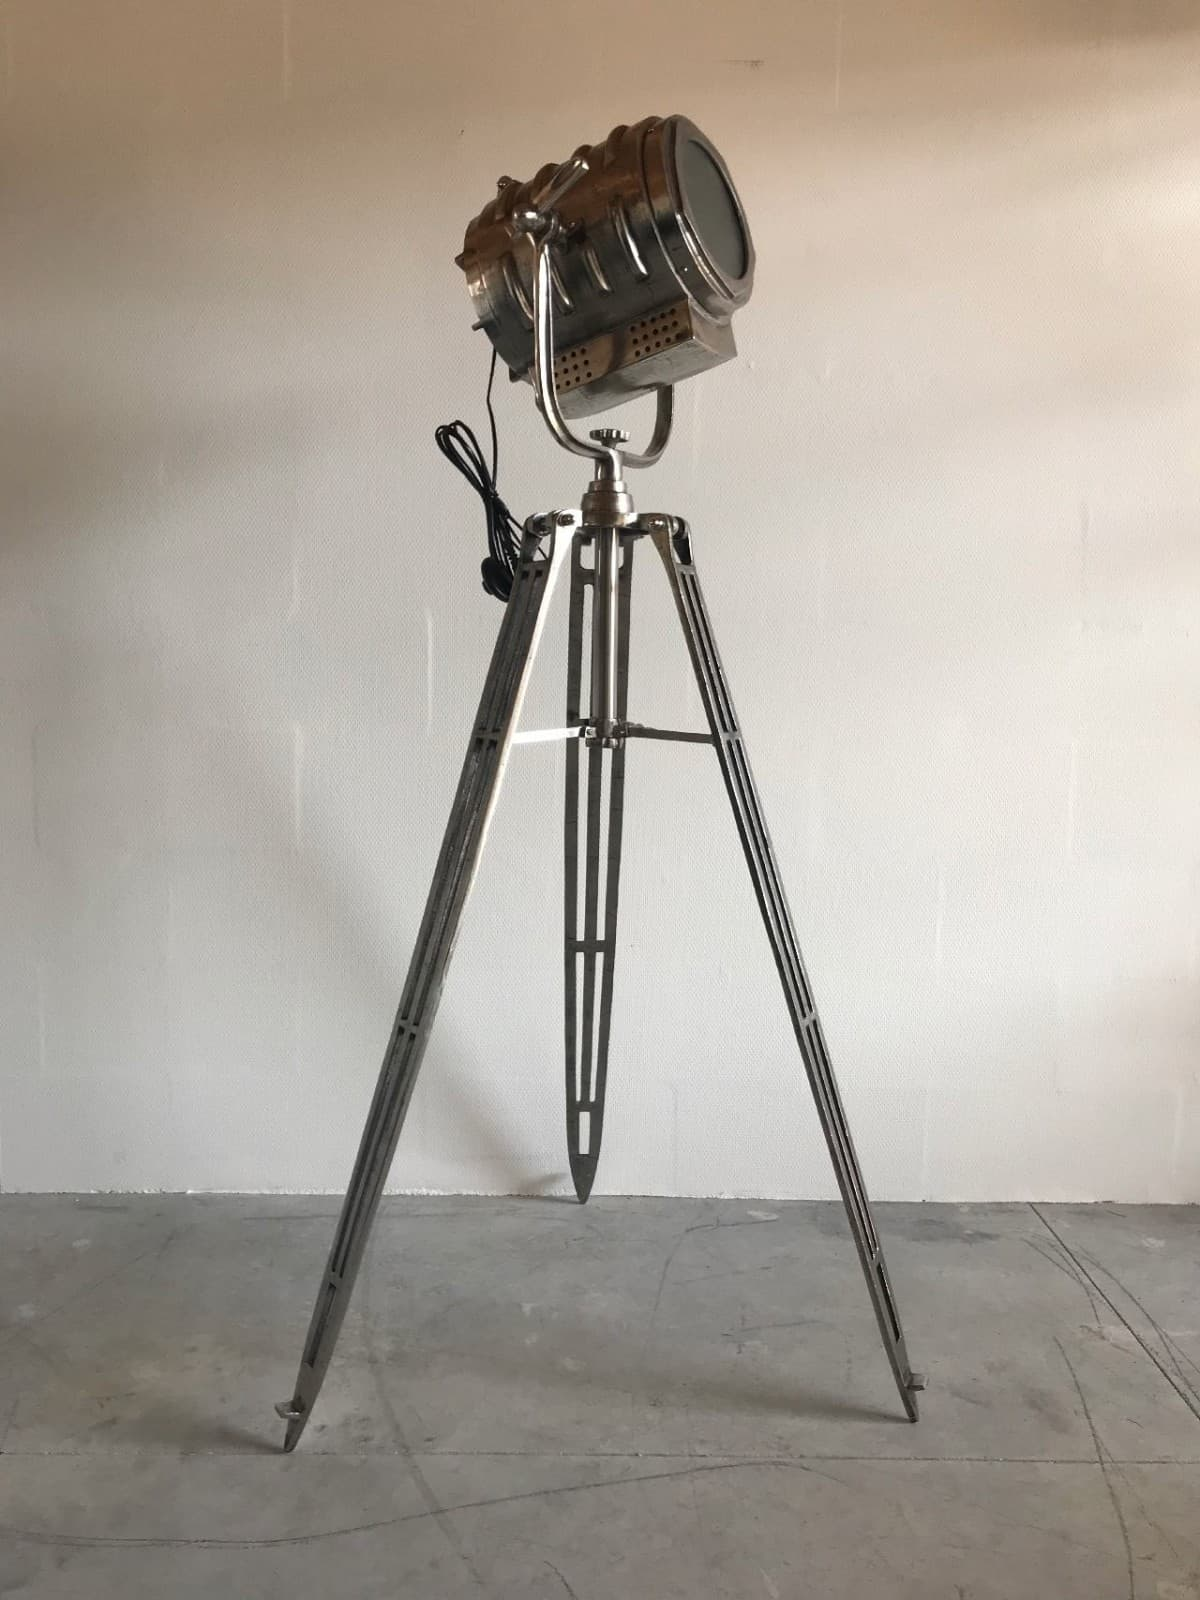 Beste Fantastische filmlamp 2 - OTIQ PB-63